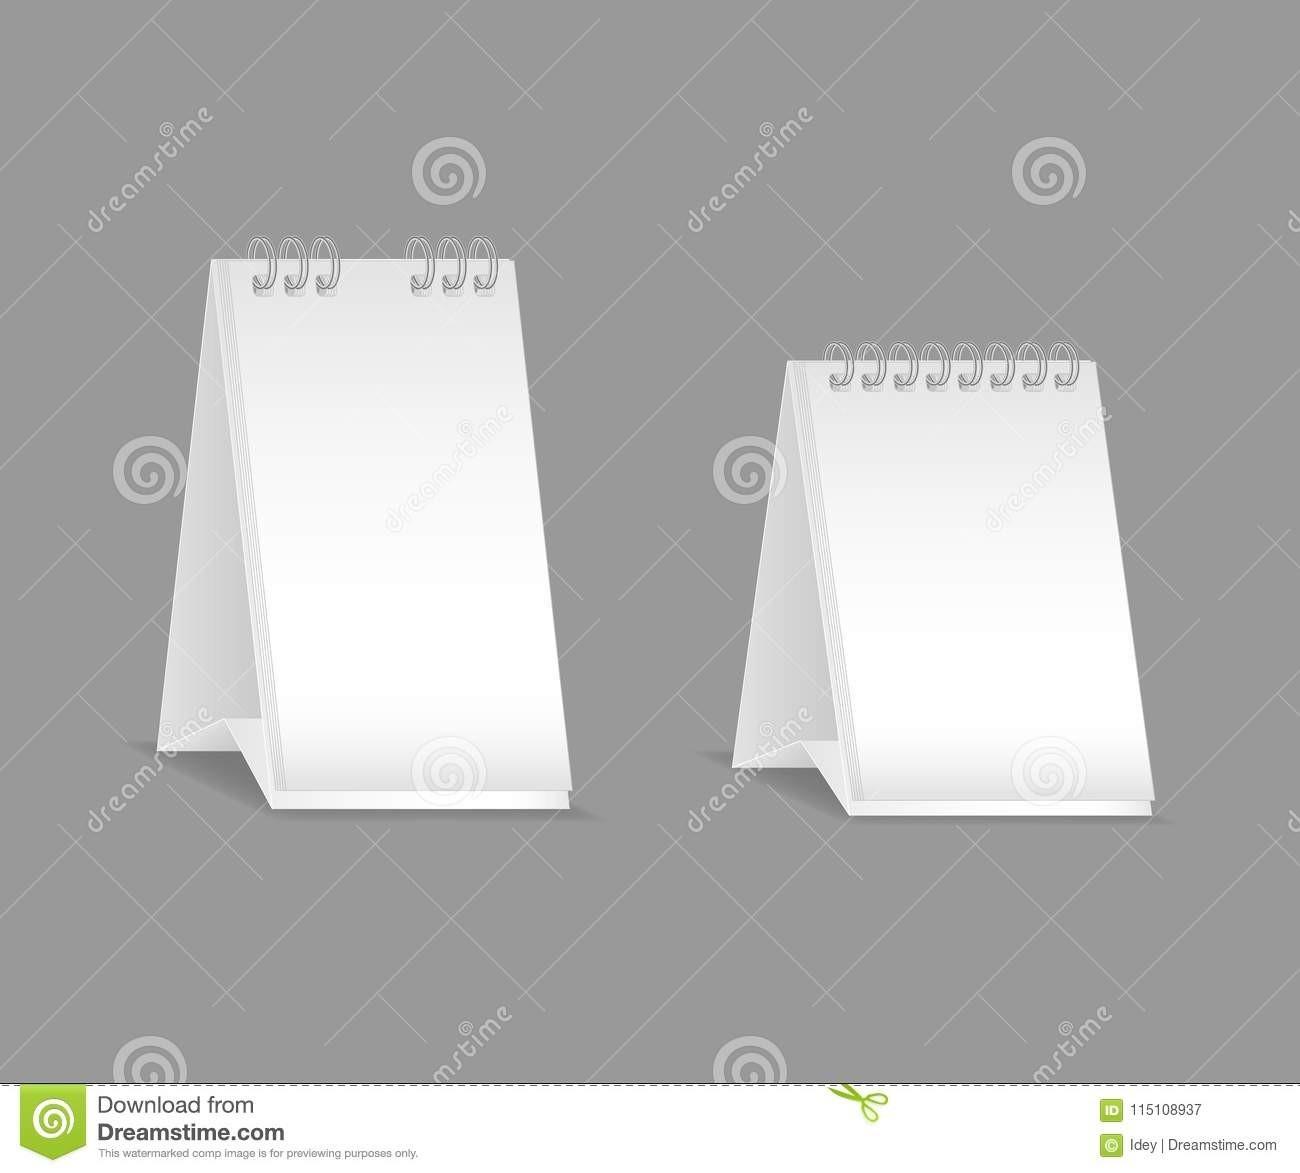 Flip Chart Template Download - The Future  Flip Chart Template